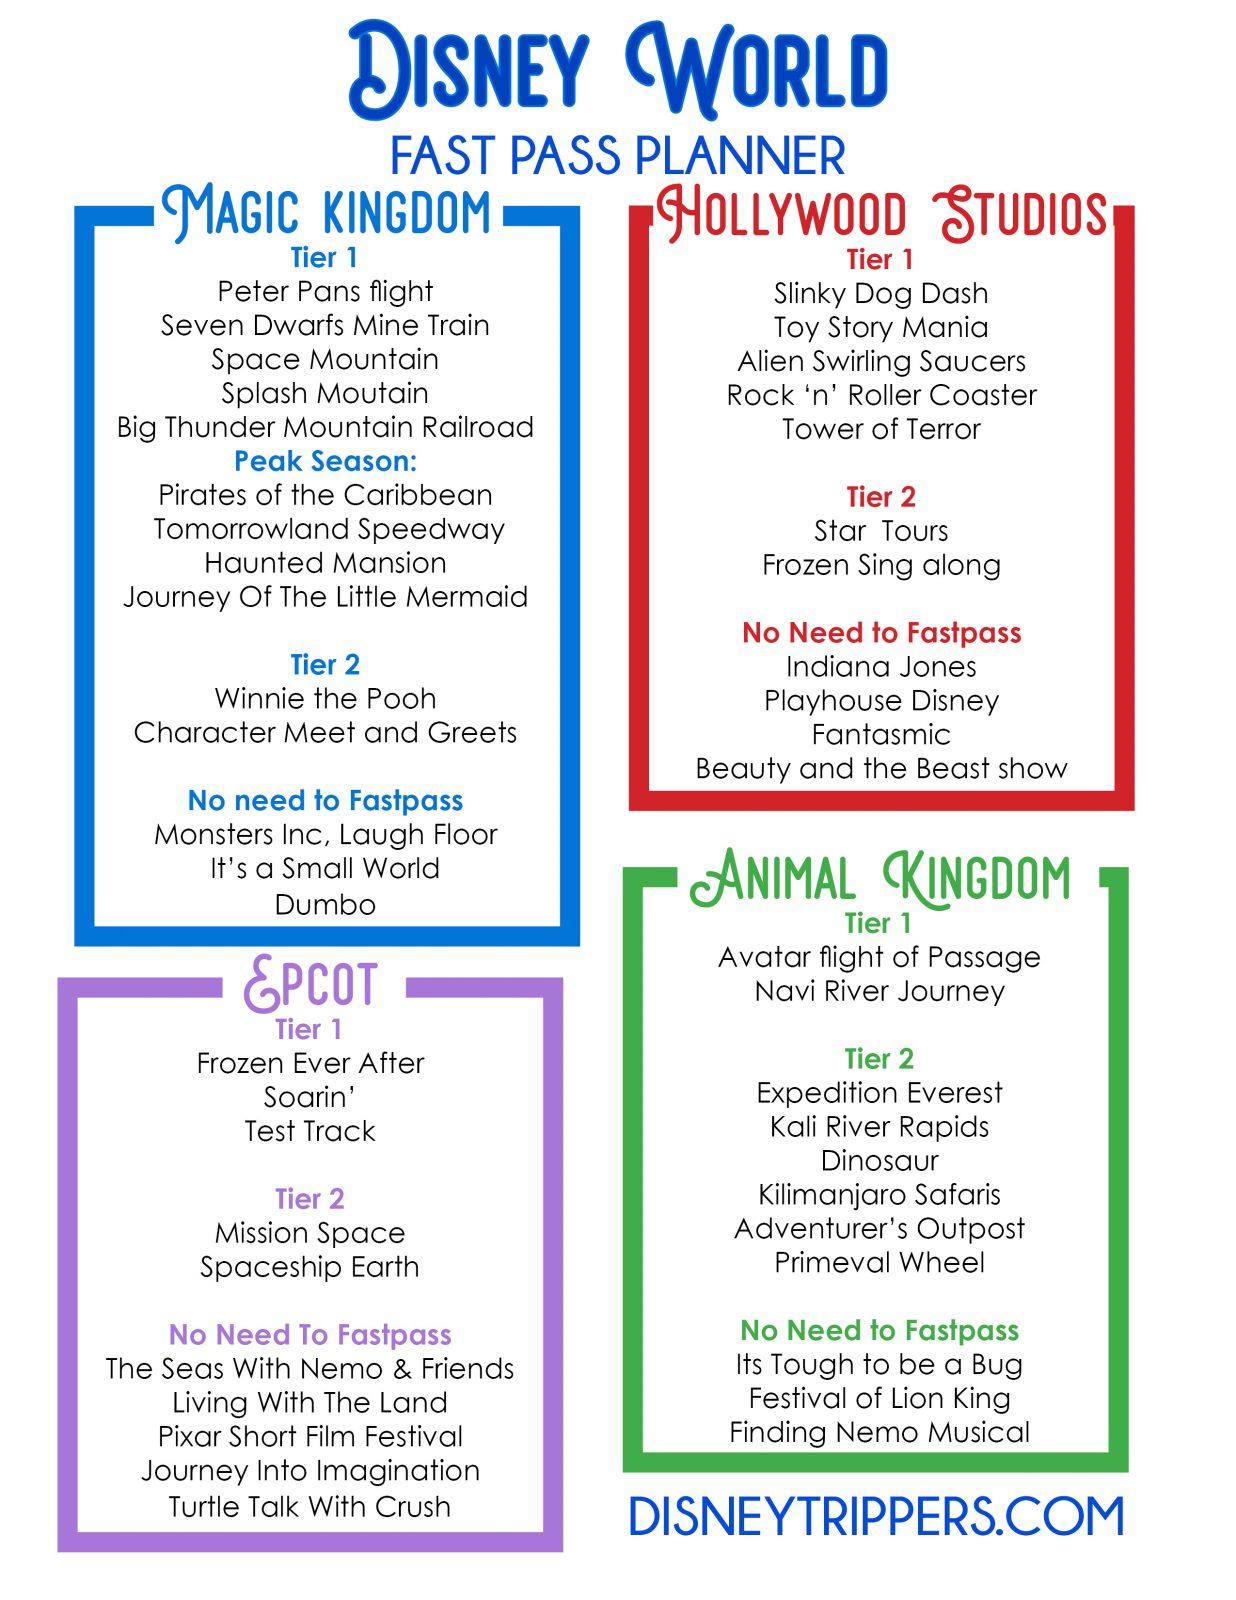 Disney World Fastpass Planner Free Printable Sheet | best fastpasses at Disney World | Disney world fastpass strategy | Disney fastpass hacks | how to pick the best fastpasses for Disney World | Disney planning tips for Fastpass strategy | how to hack Disney's Fastpass system | tips for planning a trip to Disney World | Disney travel tips #fastpass #disney